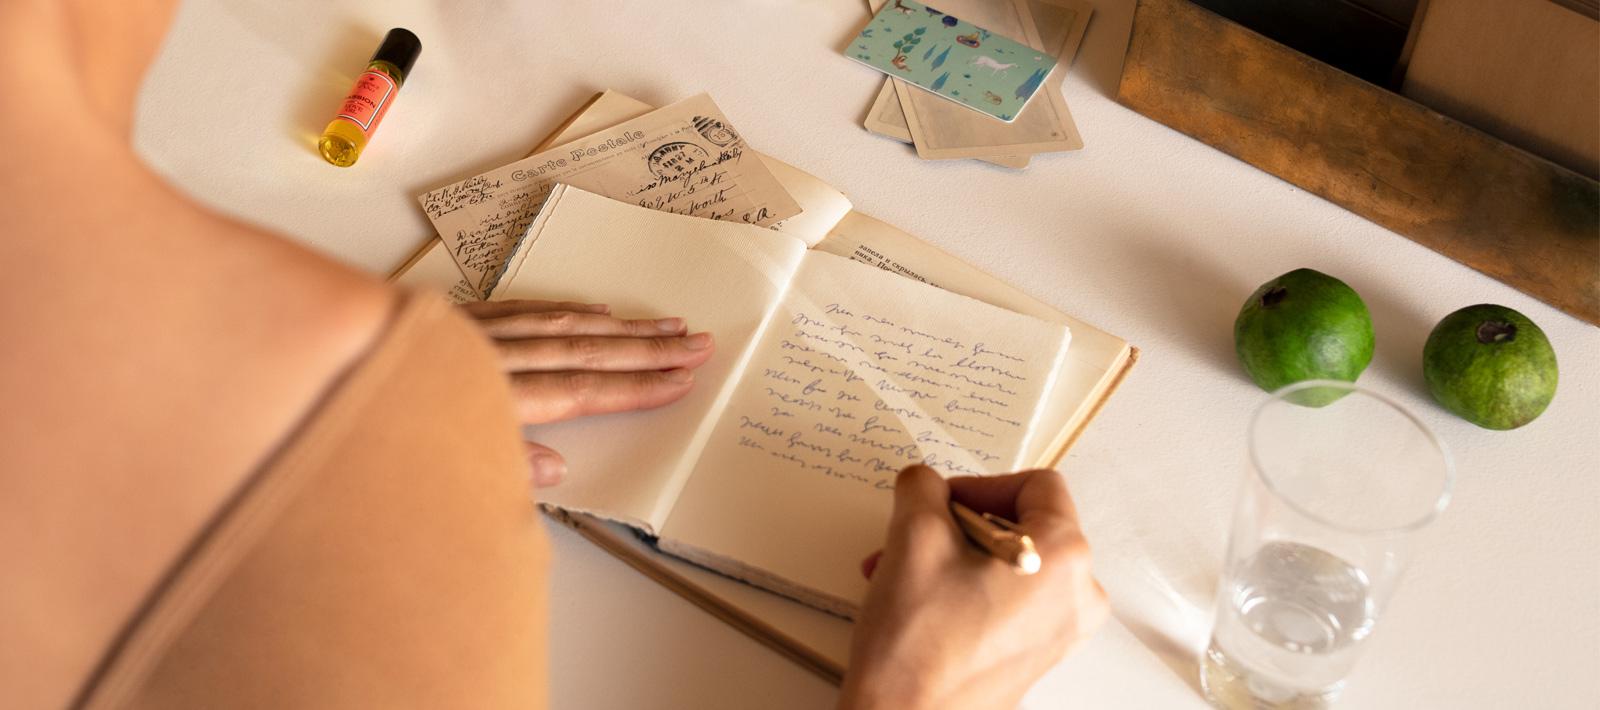 Honoring Your Feelings: 5 Tips for Starting a Journal